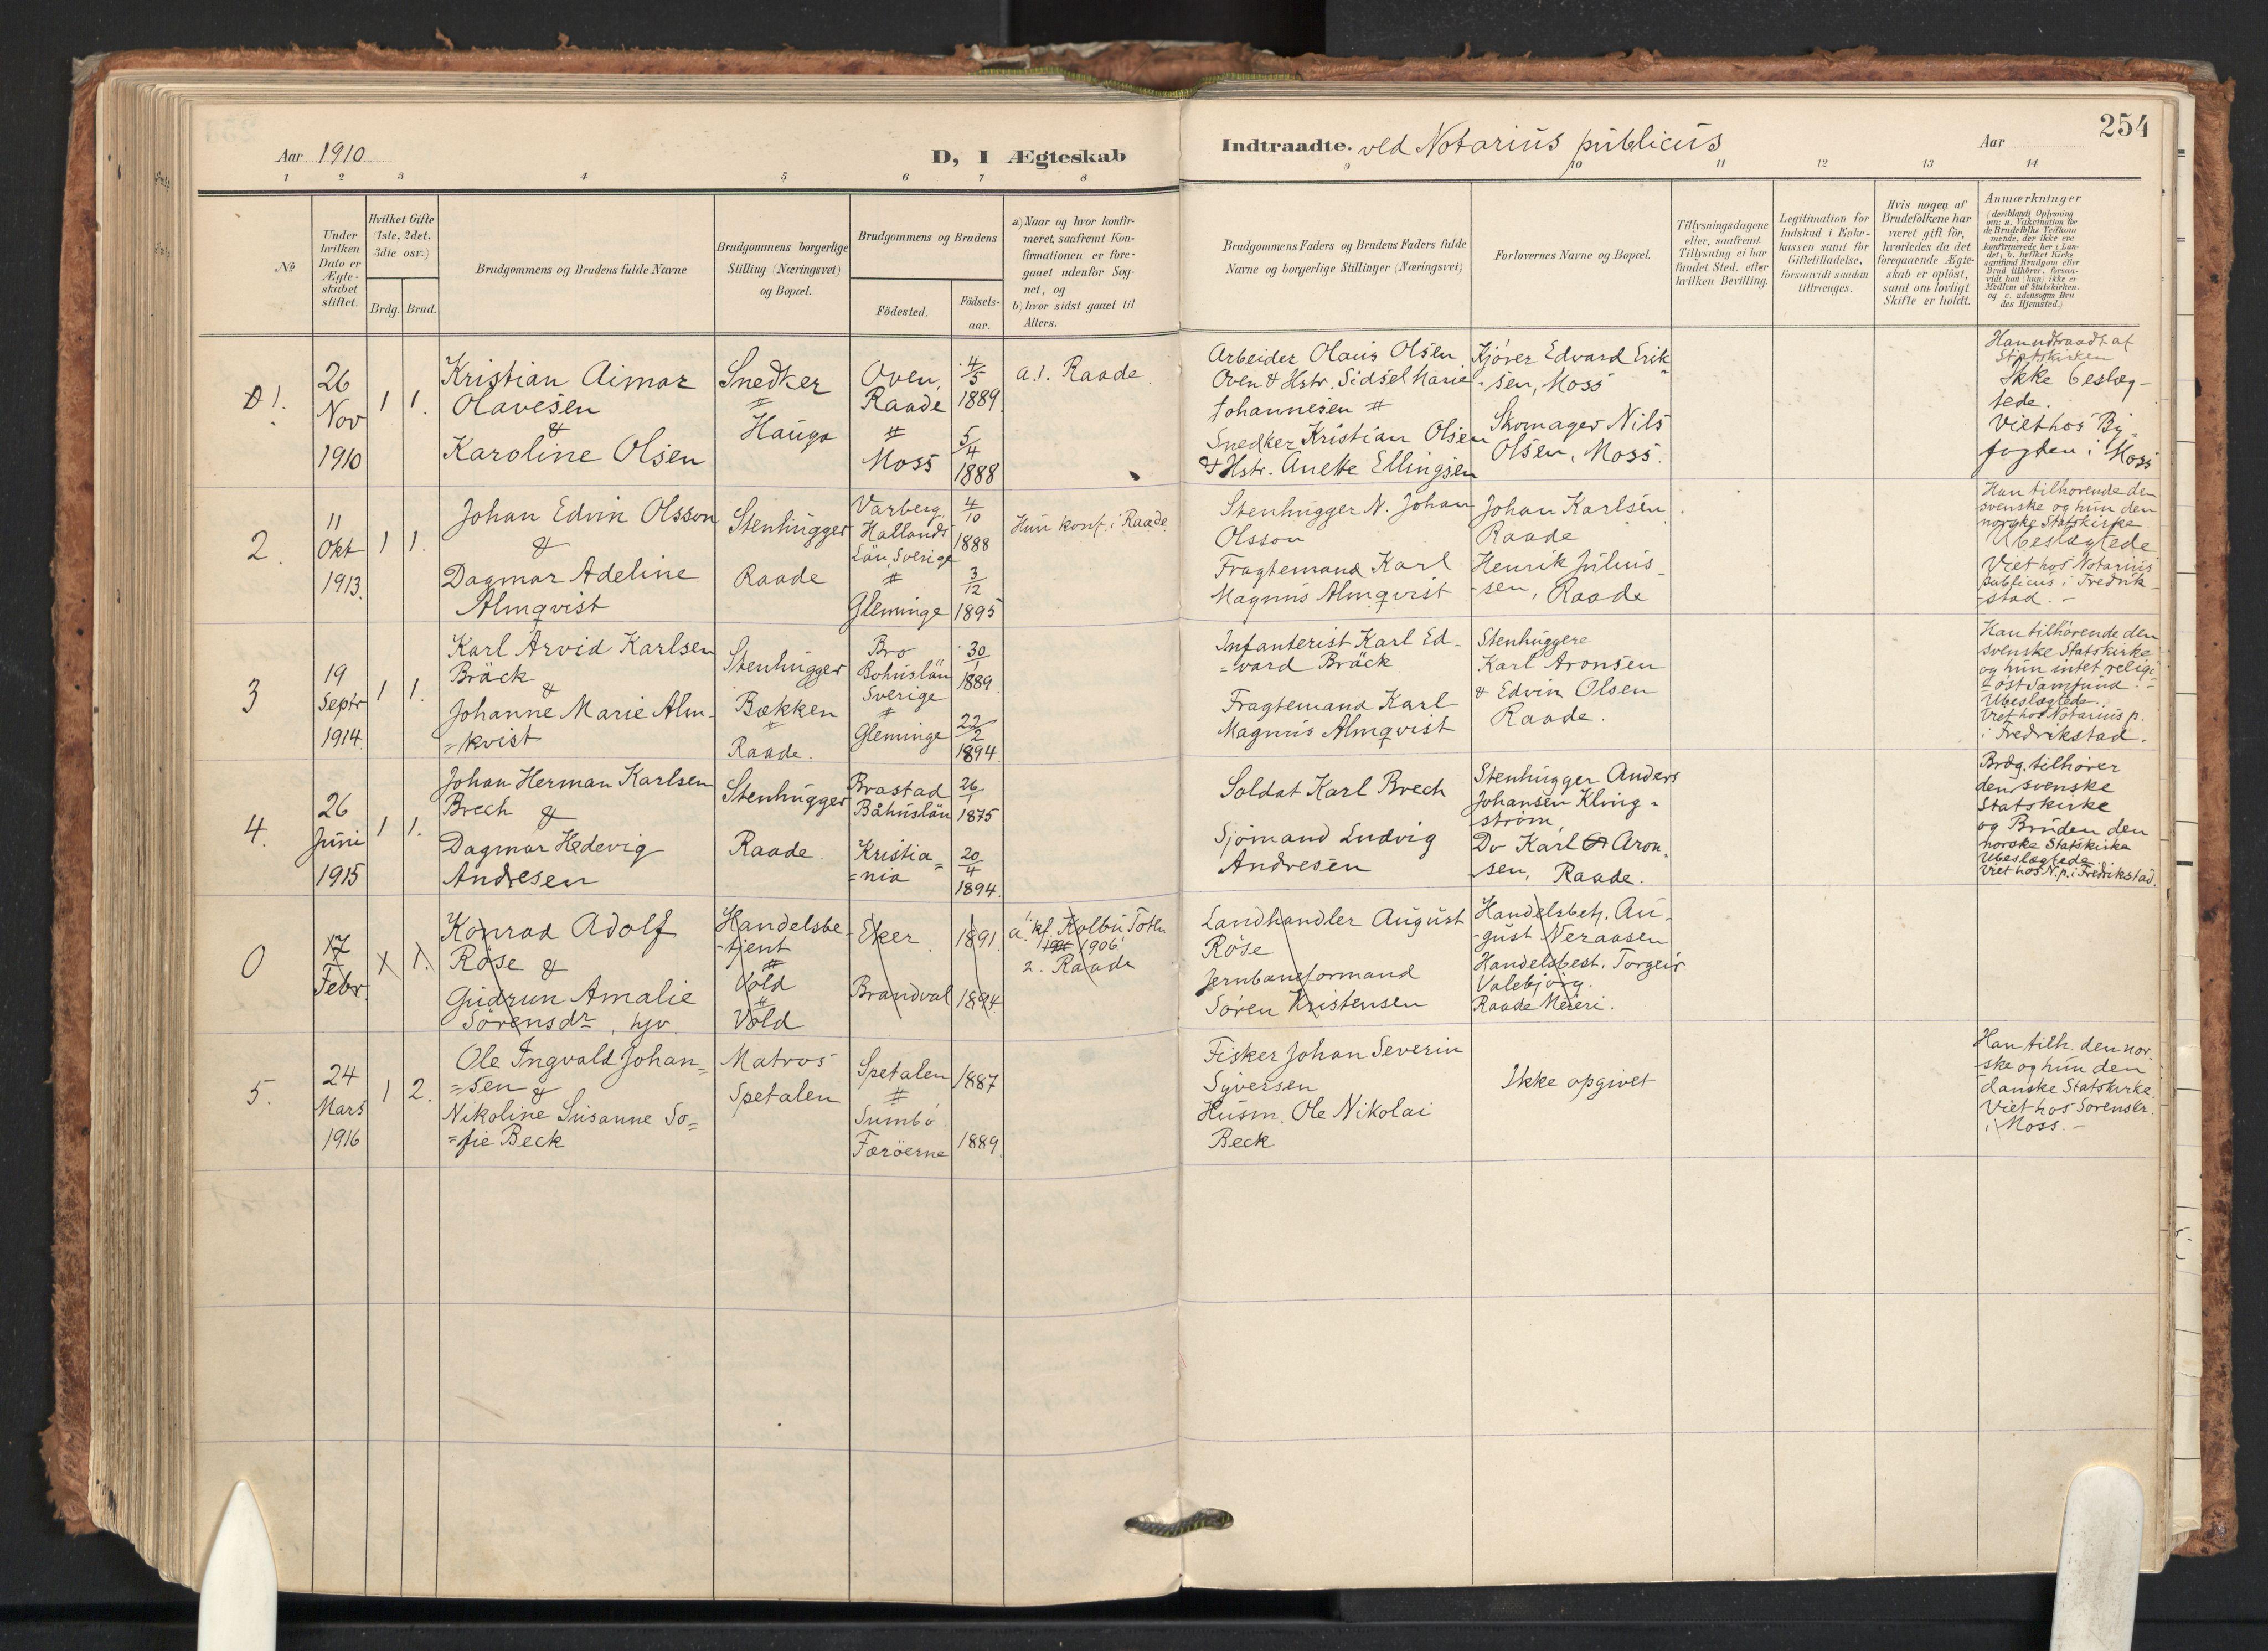 SAO, Råde prestekontor kirkebøker, F/Fa/L0008: Ministerialbok nr. 8, 1903-1924, s. 254